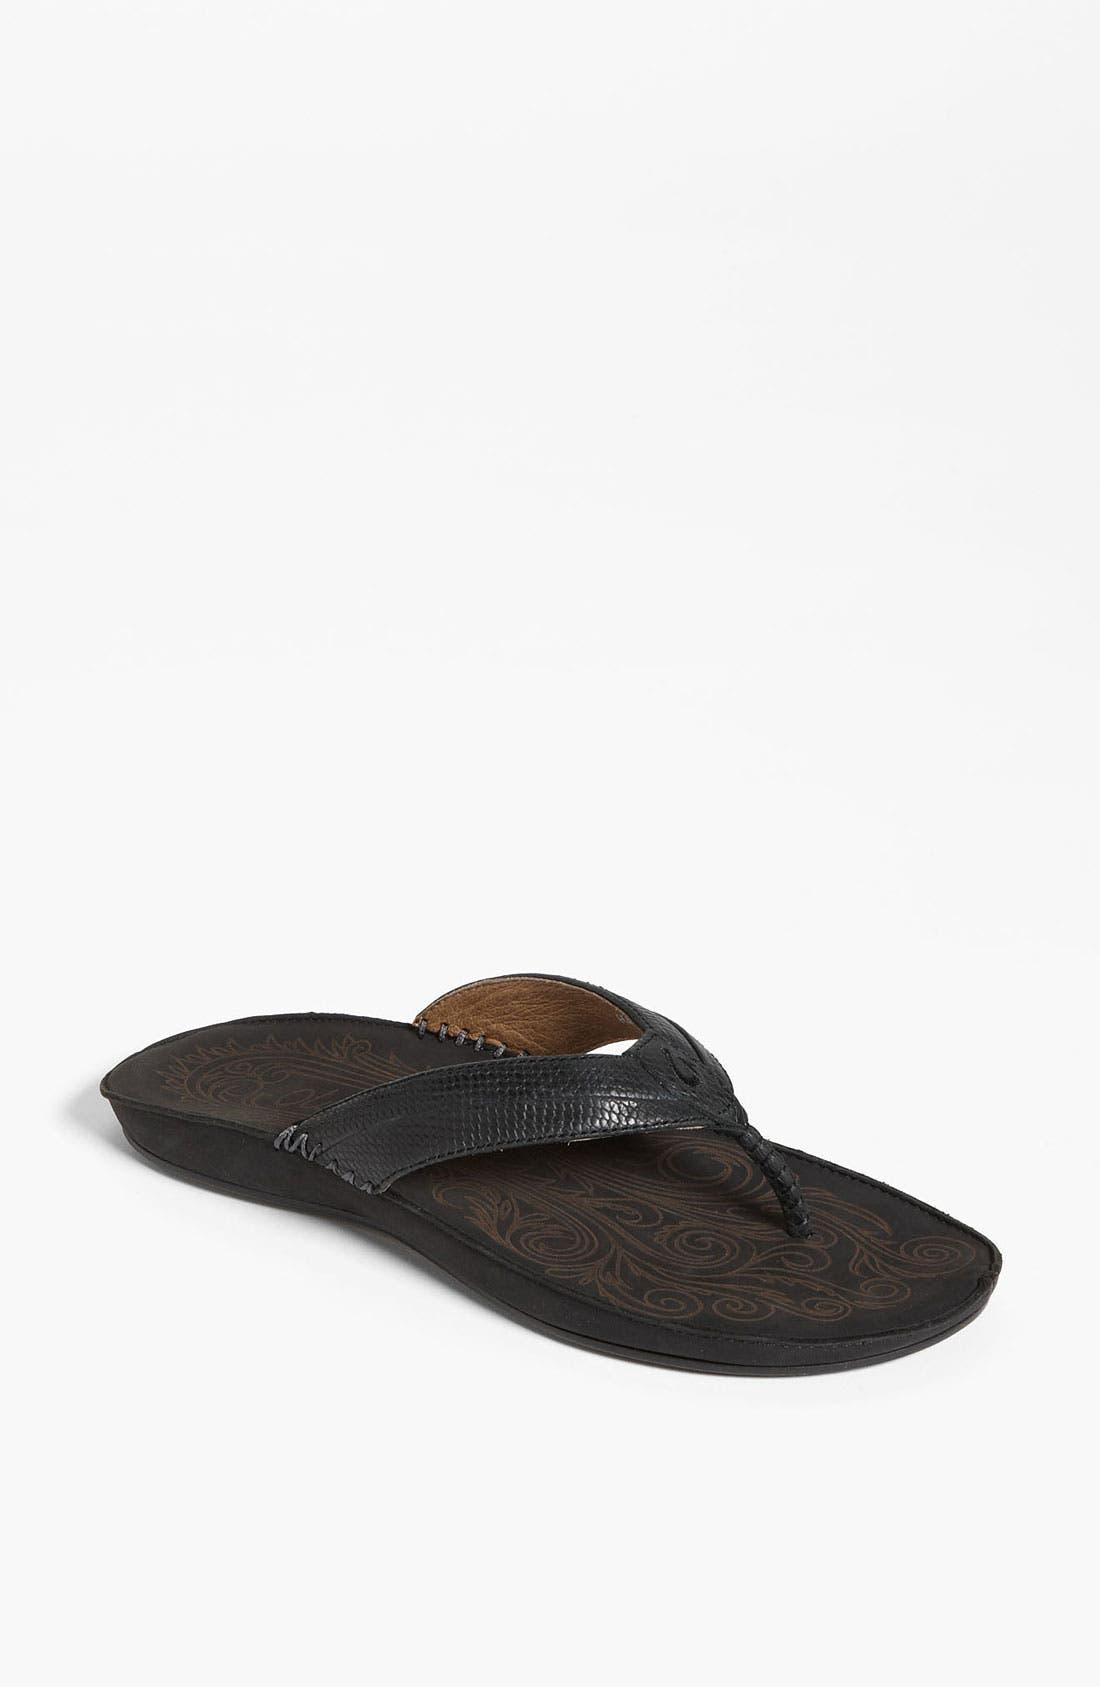 Alternate Image 1 Selected - Olukai 'Haiku Elua' Flip Flop